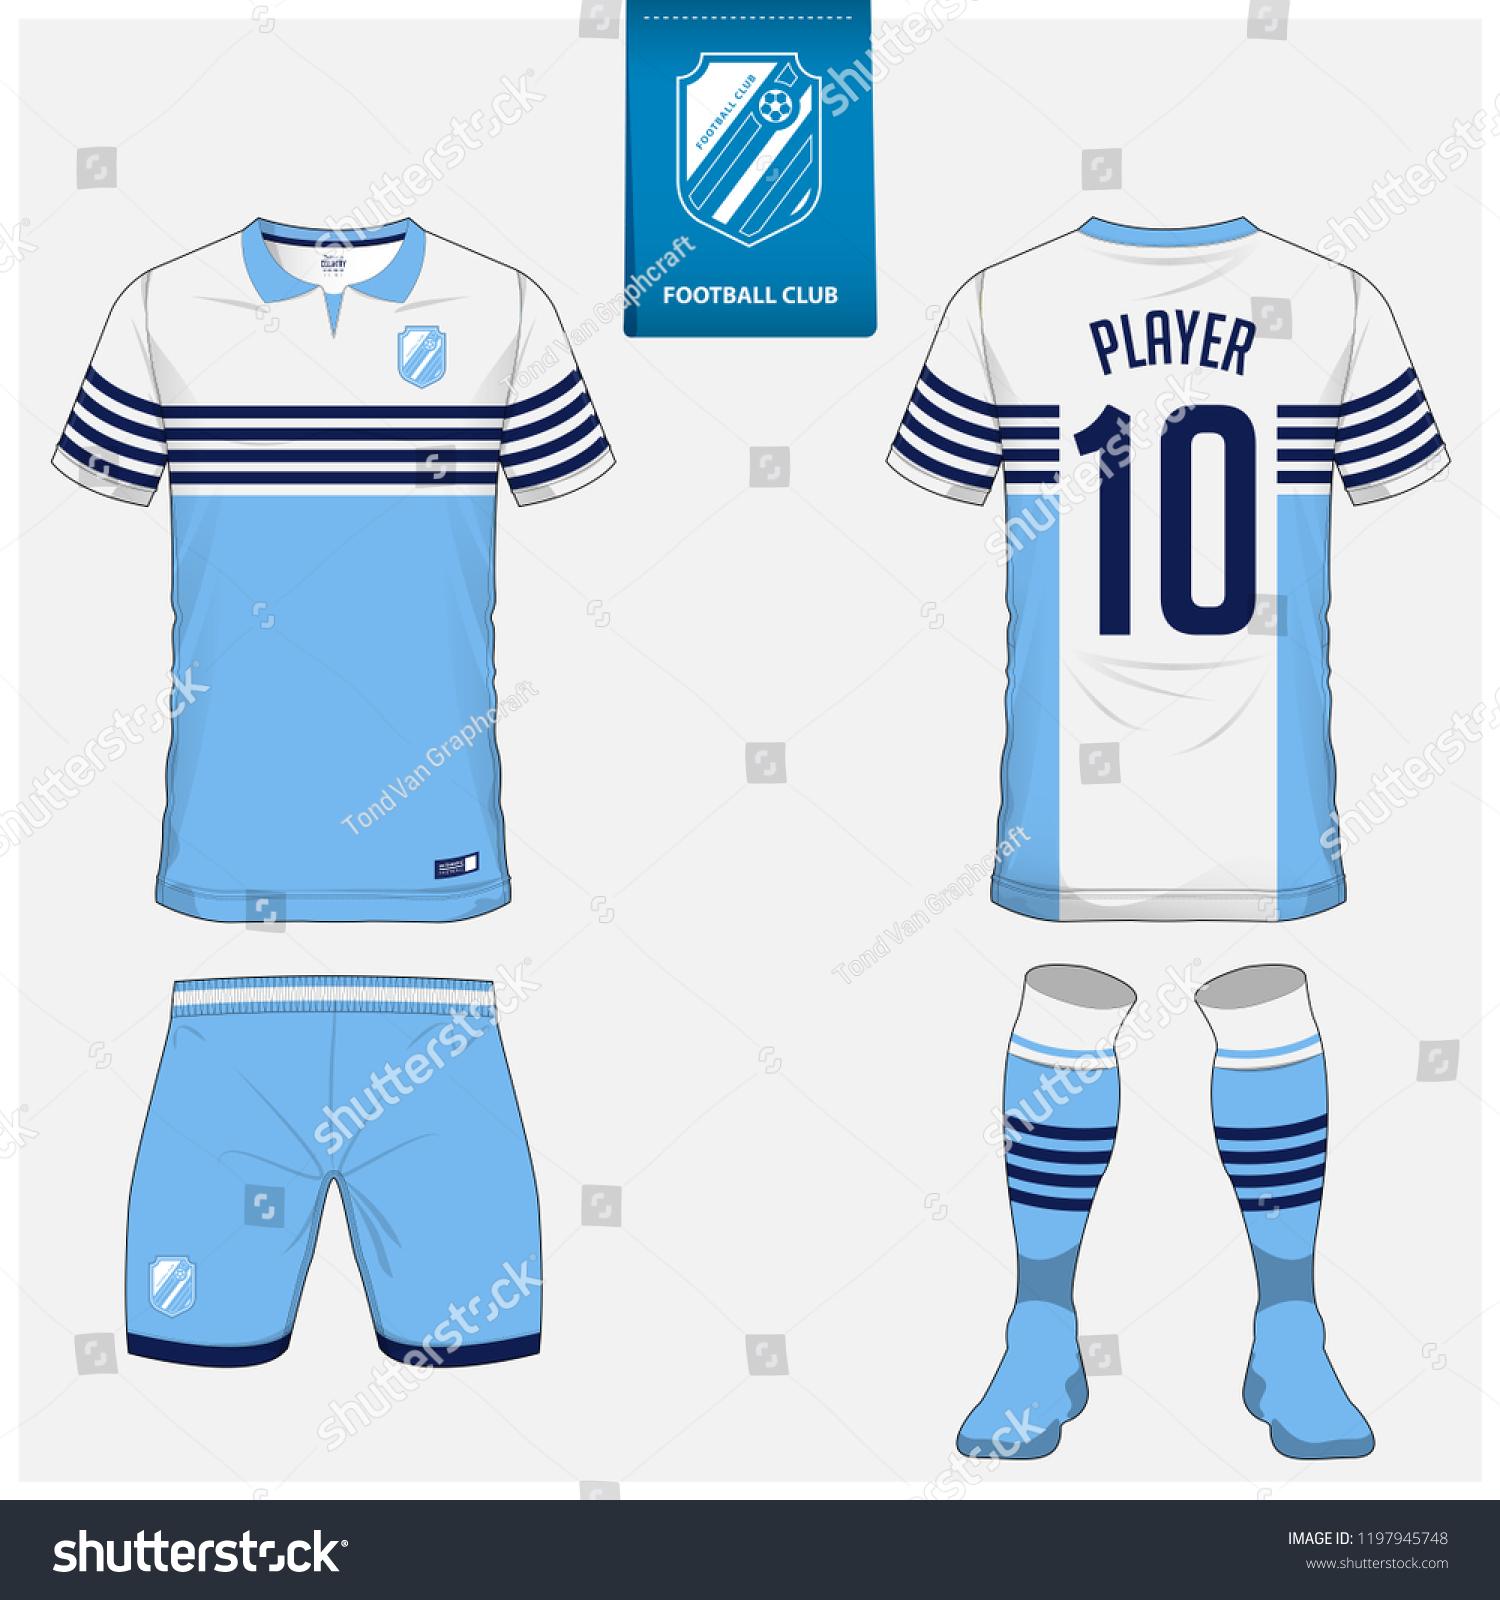 soccer jersey football kit shorts sock stock vector royalty free